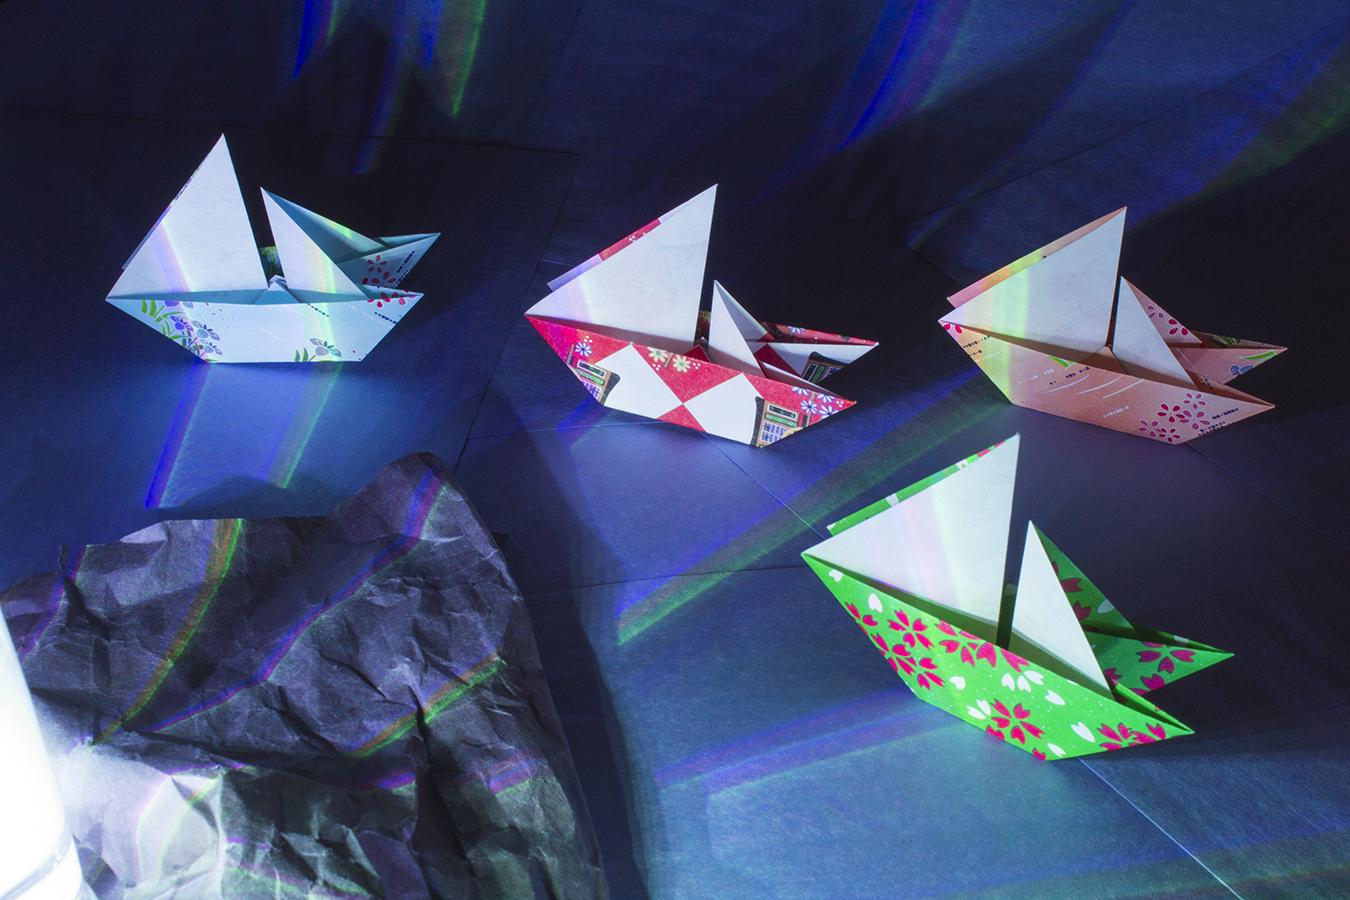 2_Lighthouse_Jonathan_Tang_UPenn_Tony_Ward_Studio_Long_Exposure_Low_Light_LED_Optics_Origami_Paper_Rock_Stone_Outcropping_Sea_Waves